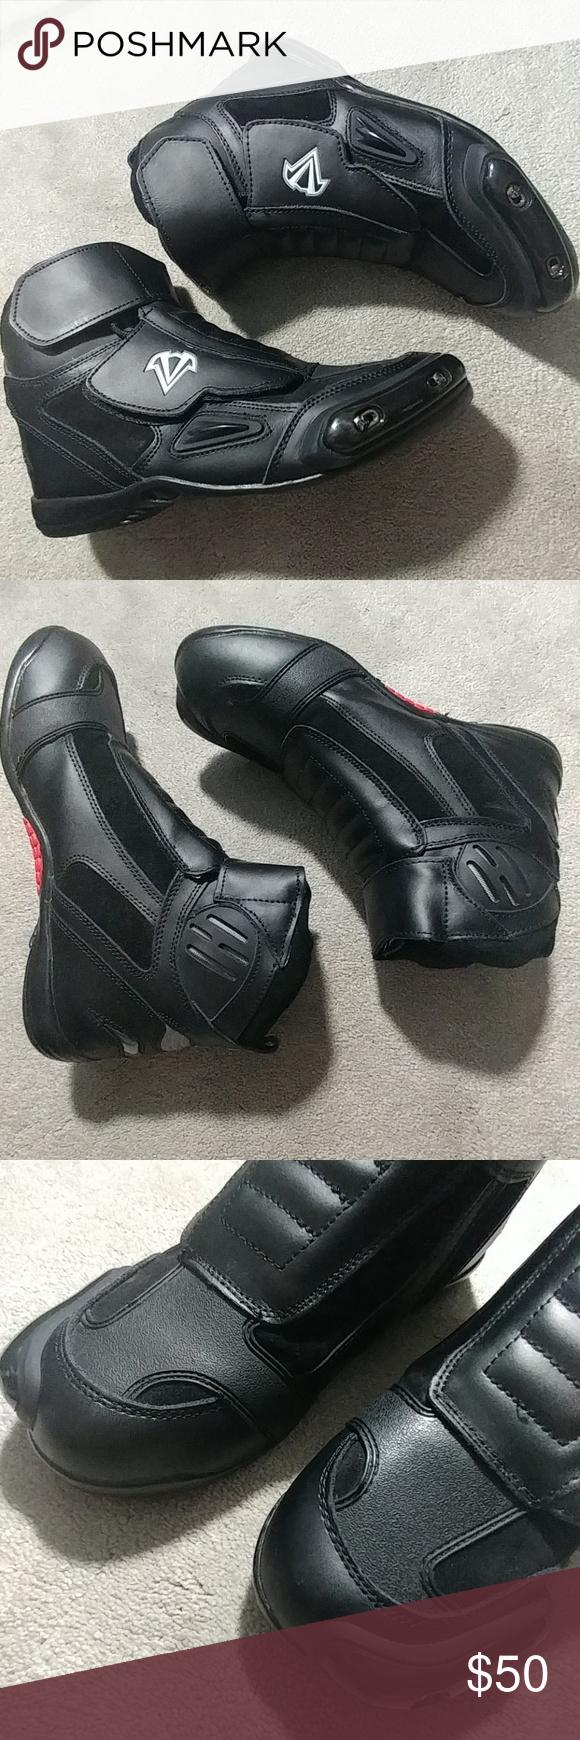 vendu vega fusionner les bottes de moto sz sz sz pinterest 66e505